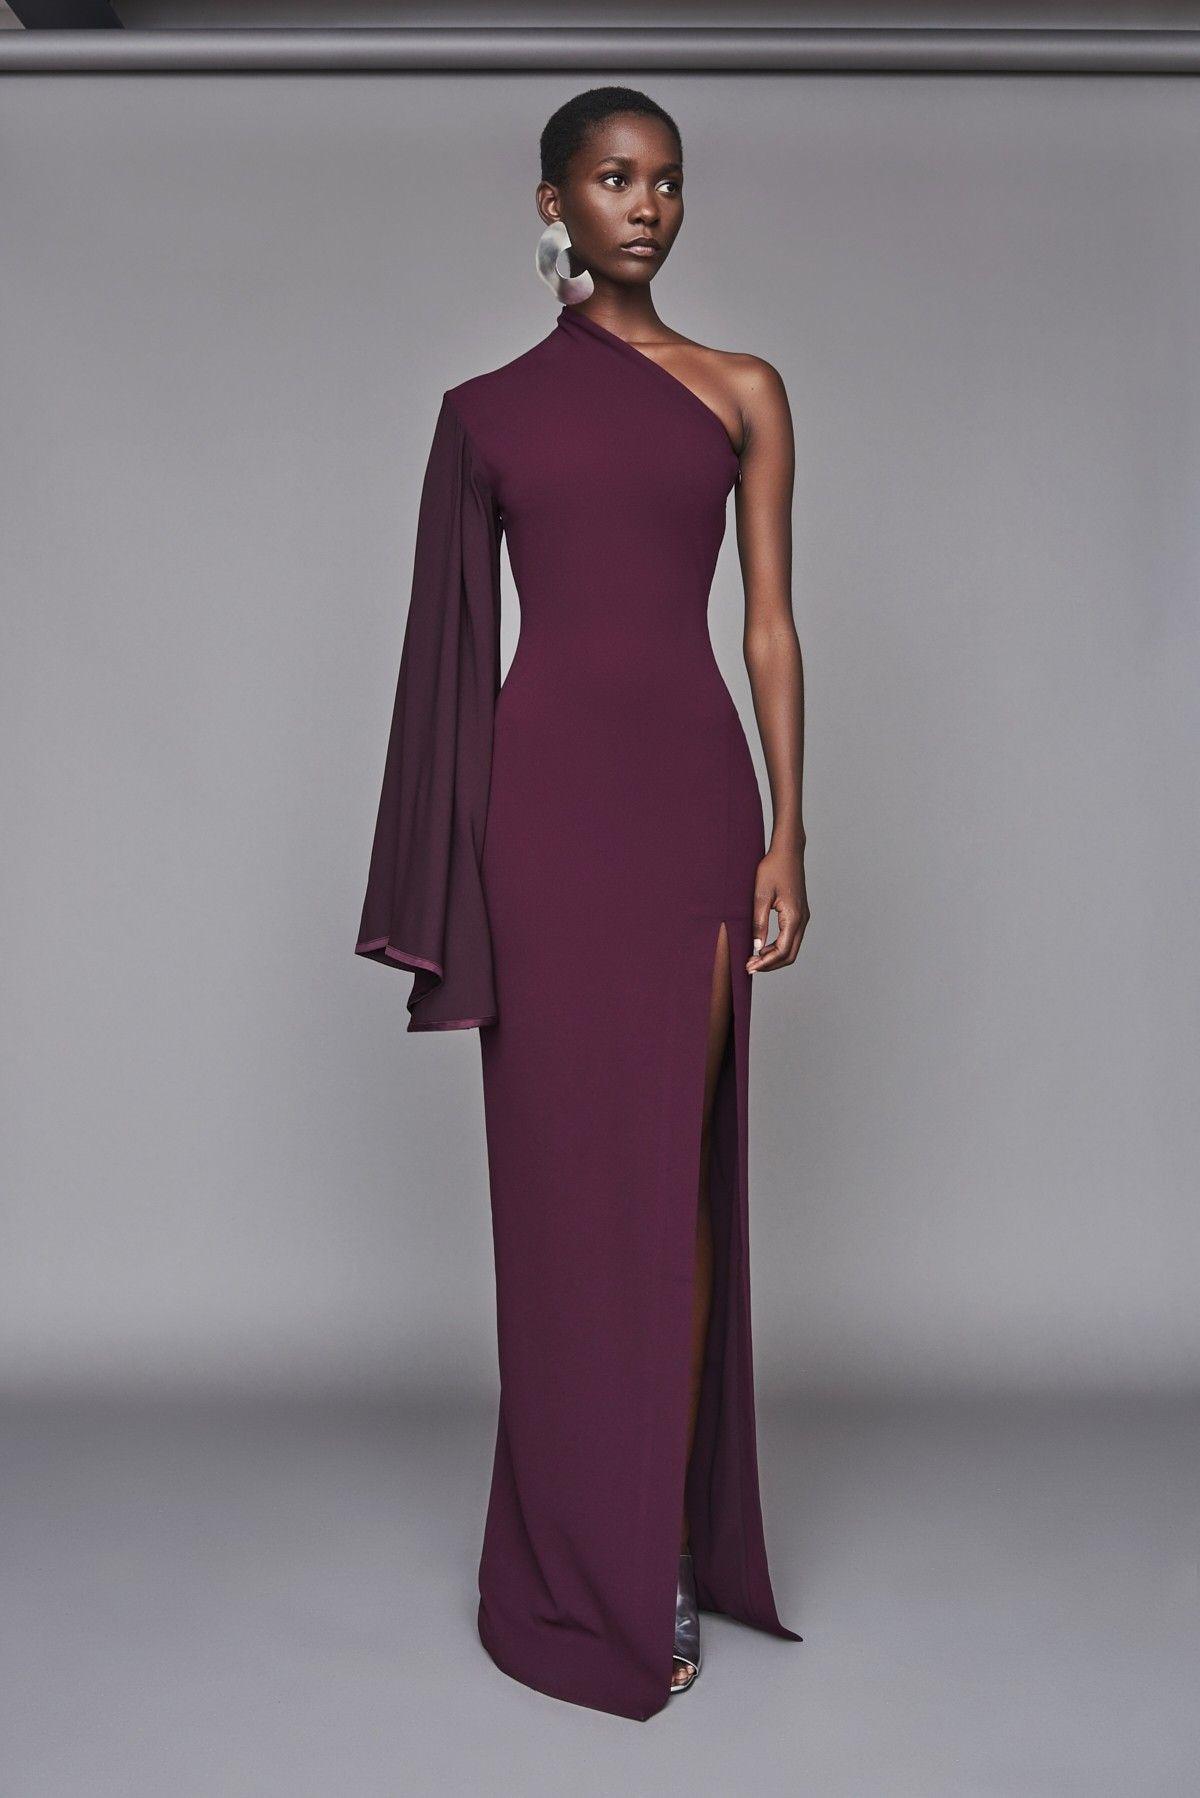 a5cb5dca945 Solace London Lani Dress Aubergine